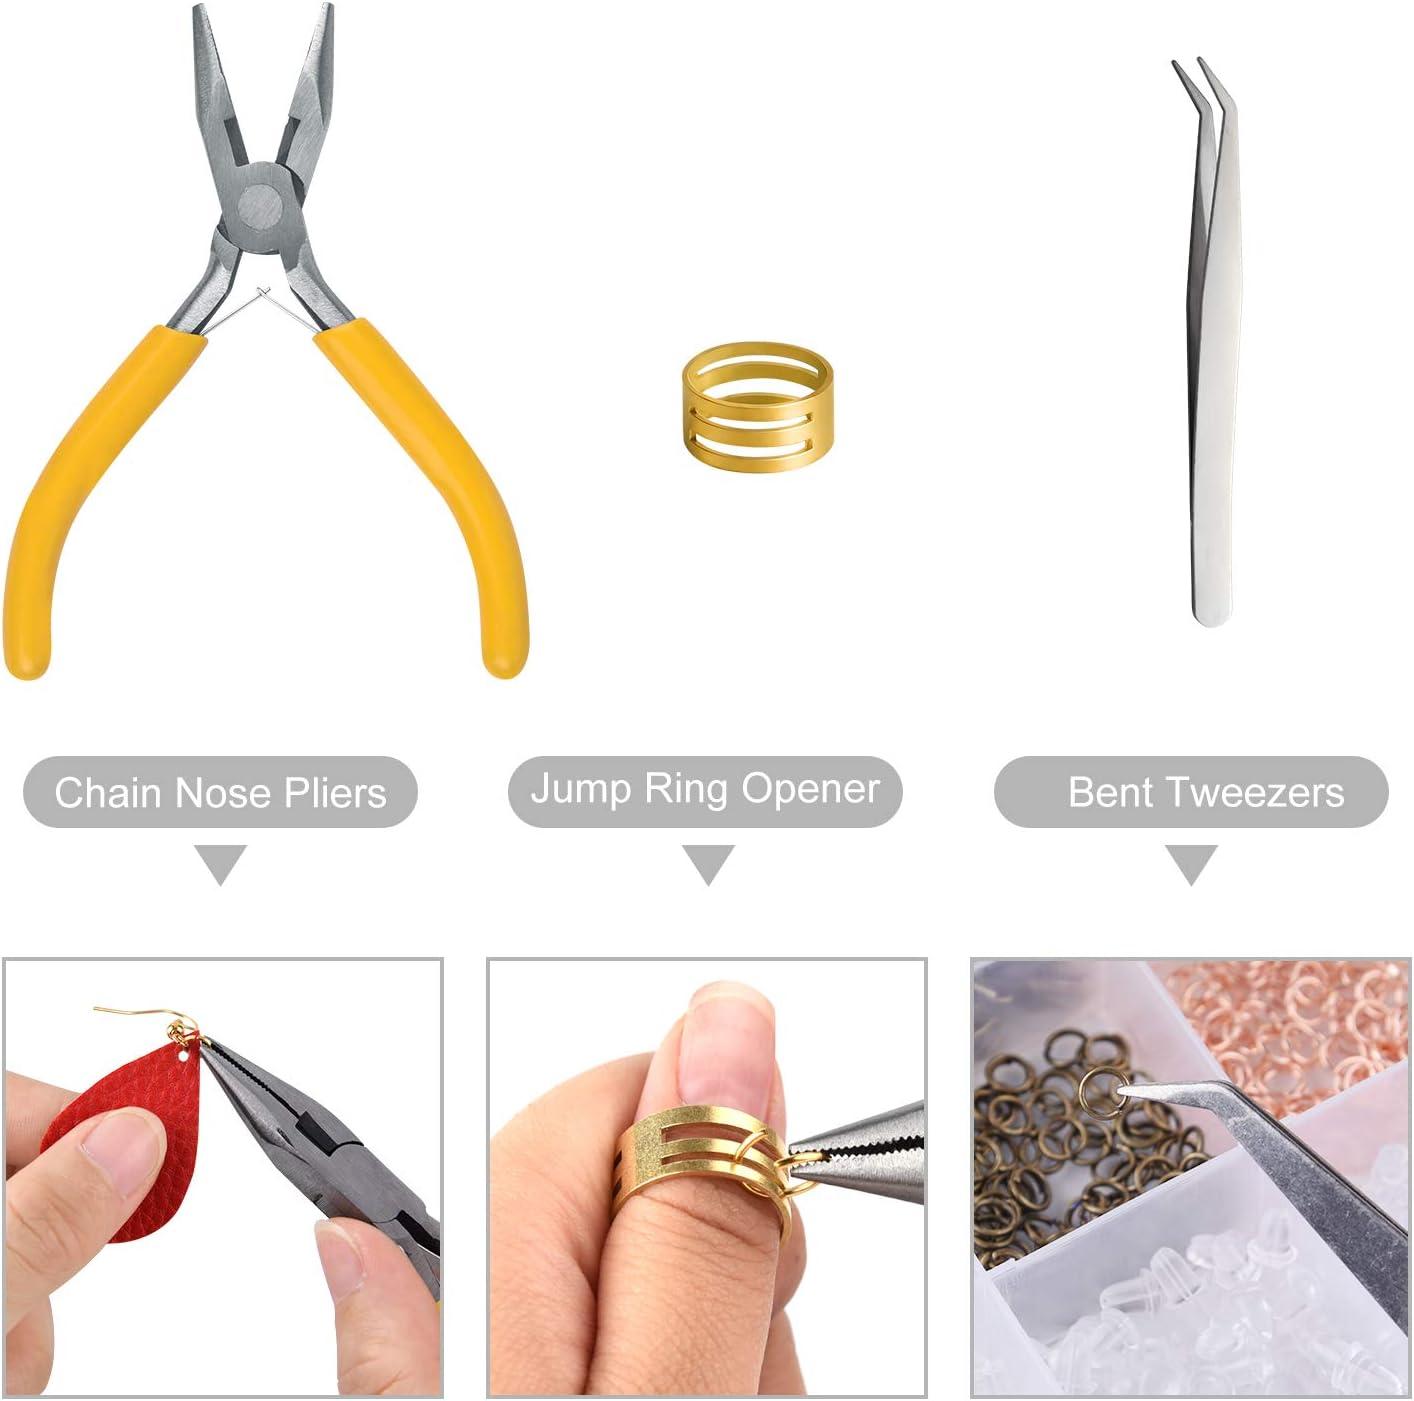 TUPARKA 2300PCS Earring Making Kits Jewelry Making Supplies Includes Earring Hooks Jump Rings Earring Backs Earring Cards for Jewelry Making and Earring Repair